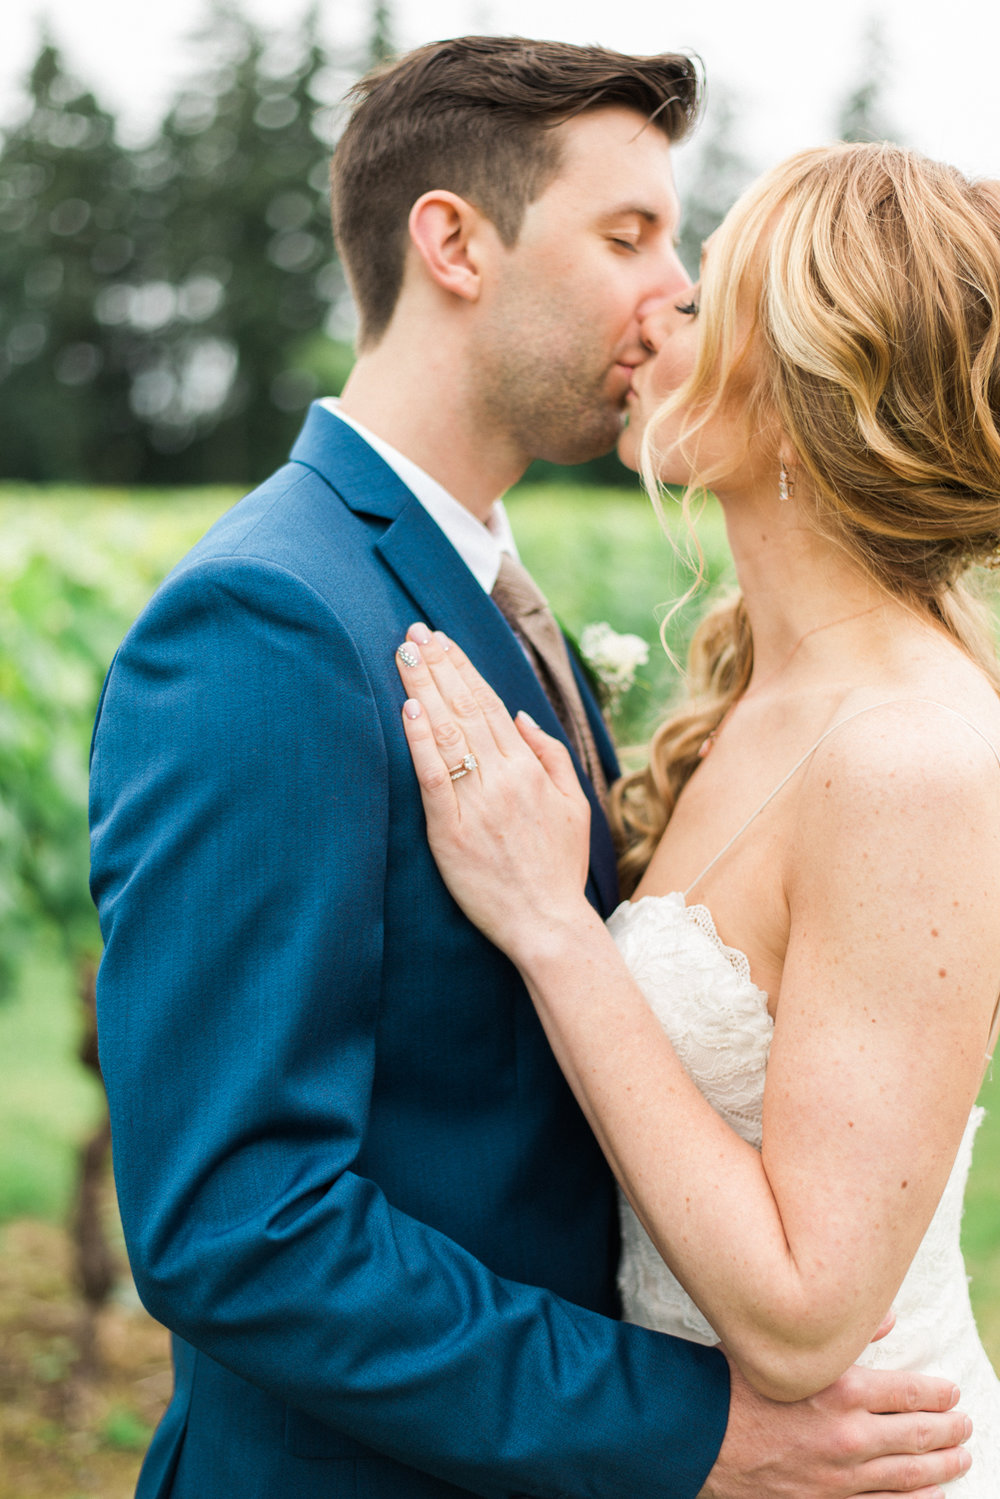 portland-wedding-photography-bethany-vineyard-shelley-marie-photo-019.jpg